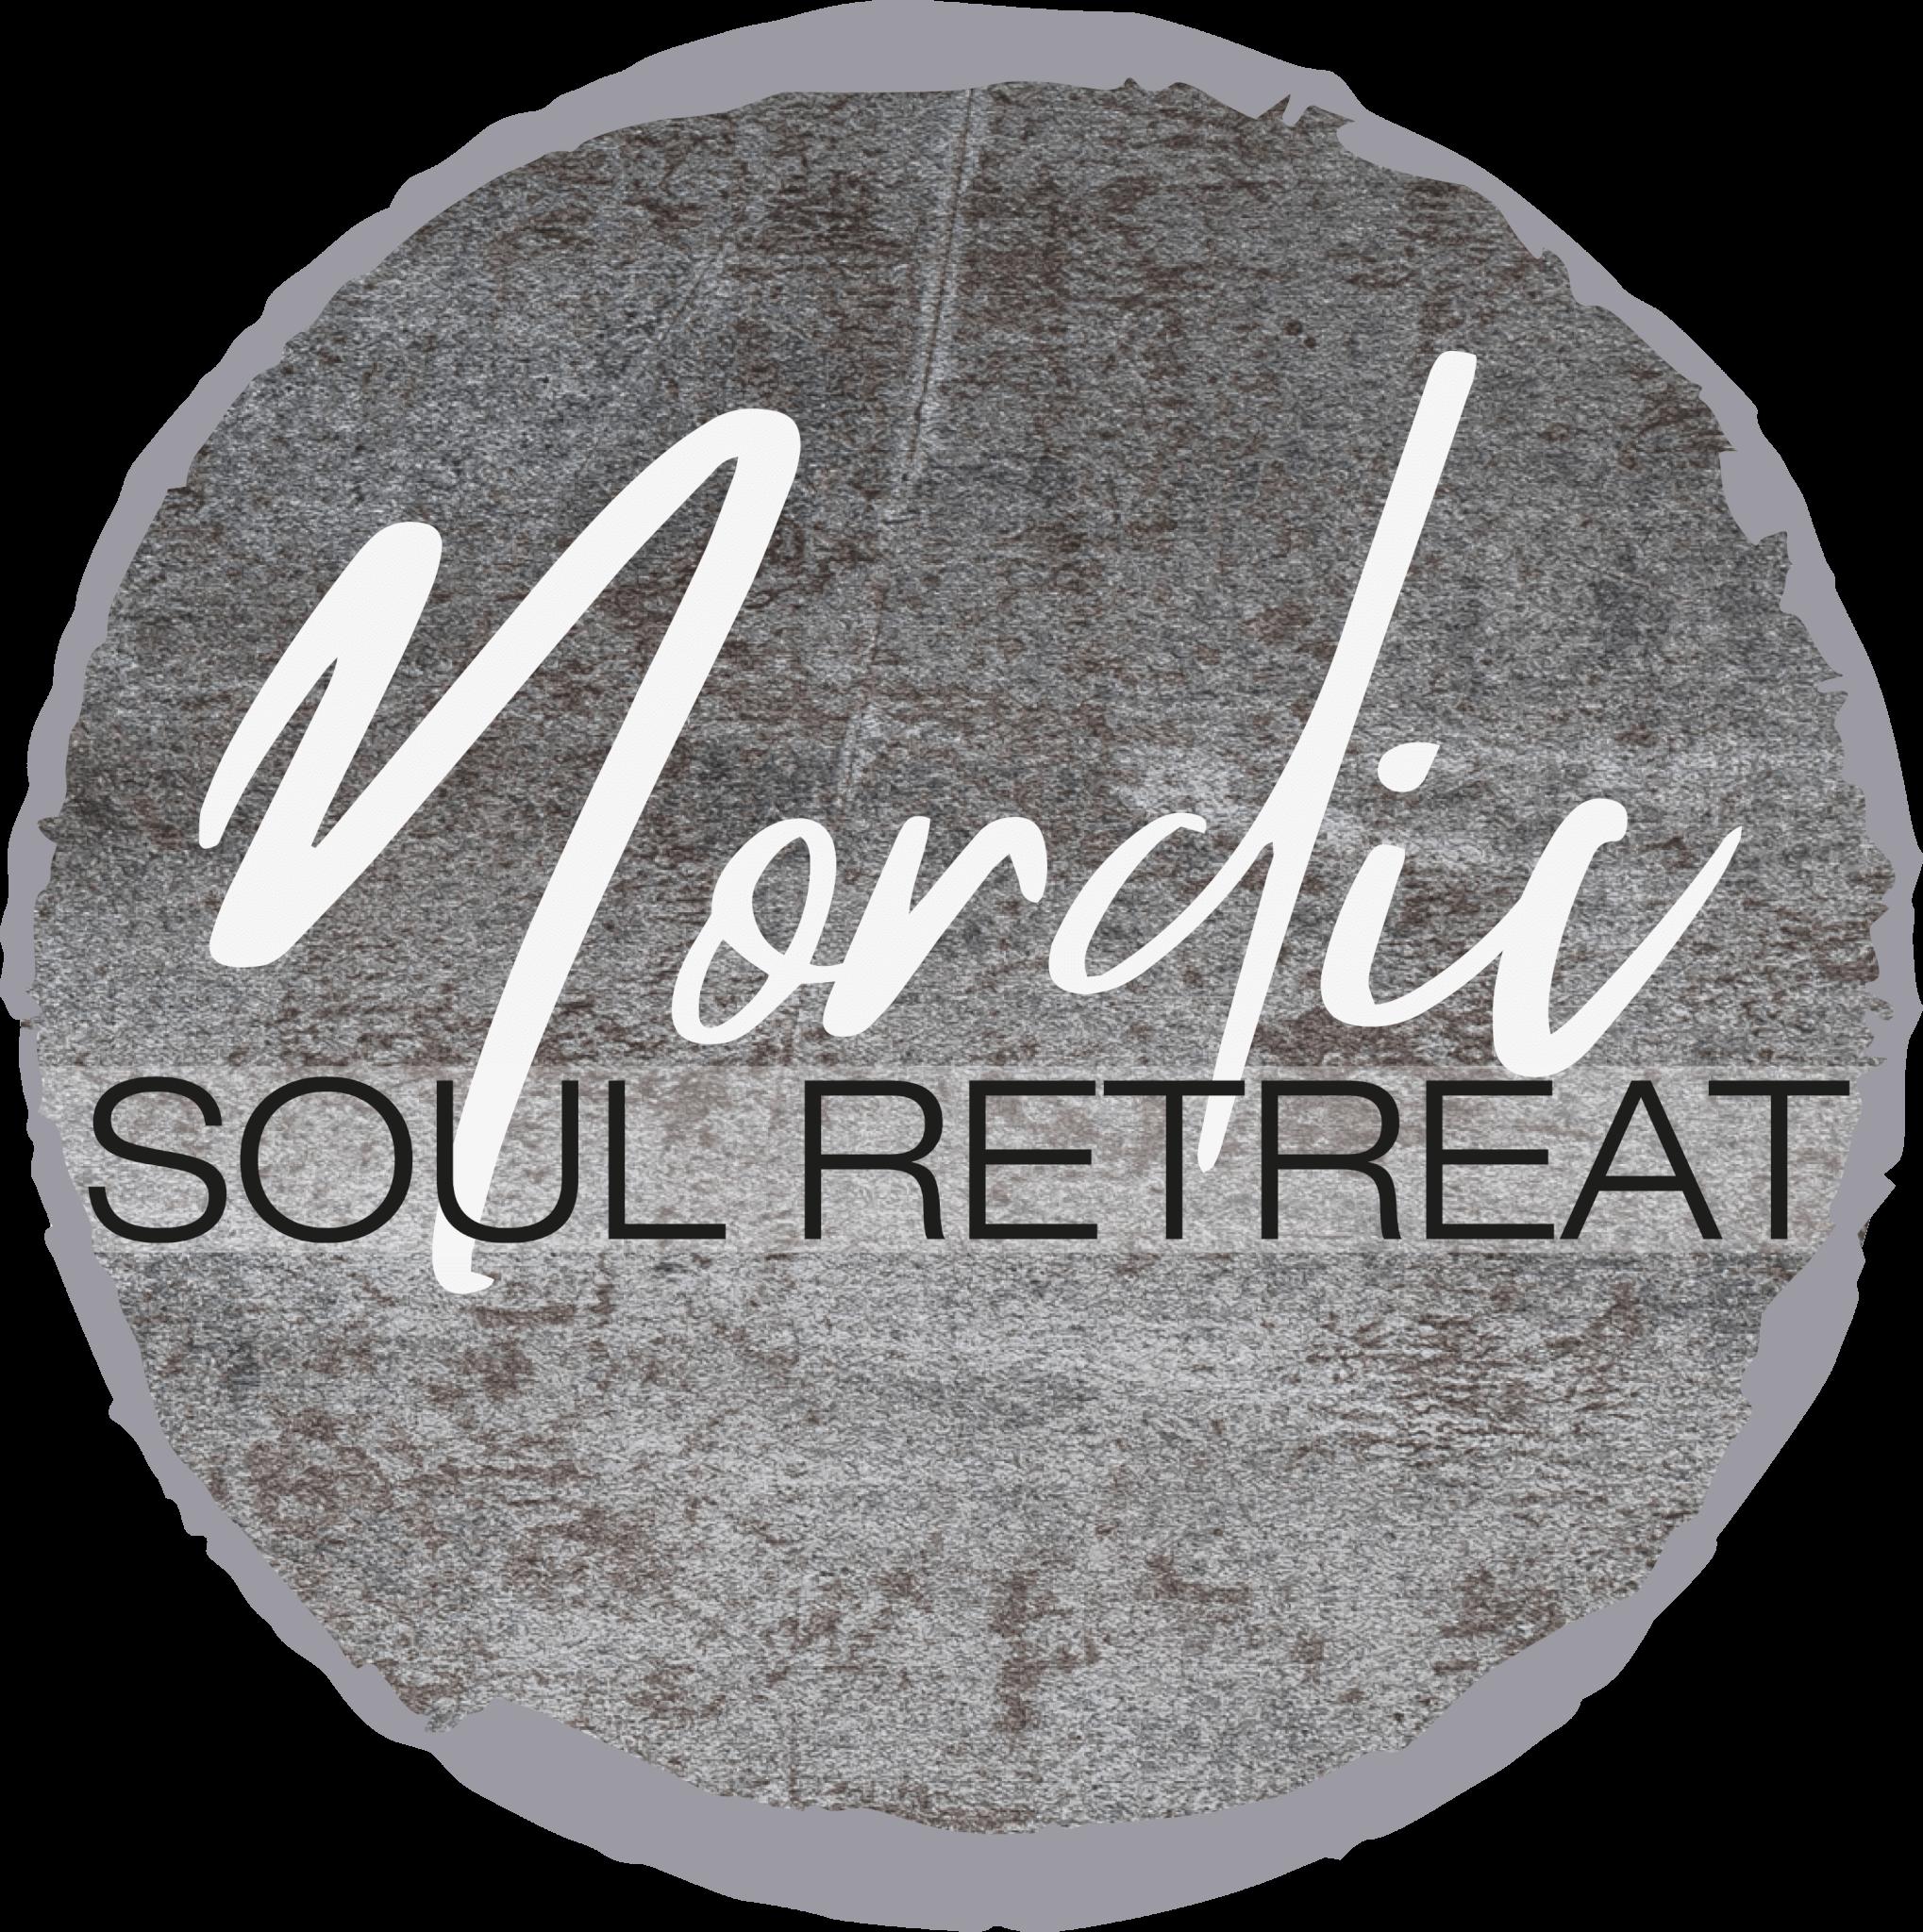 Nordic Soul Retreat